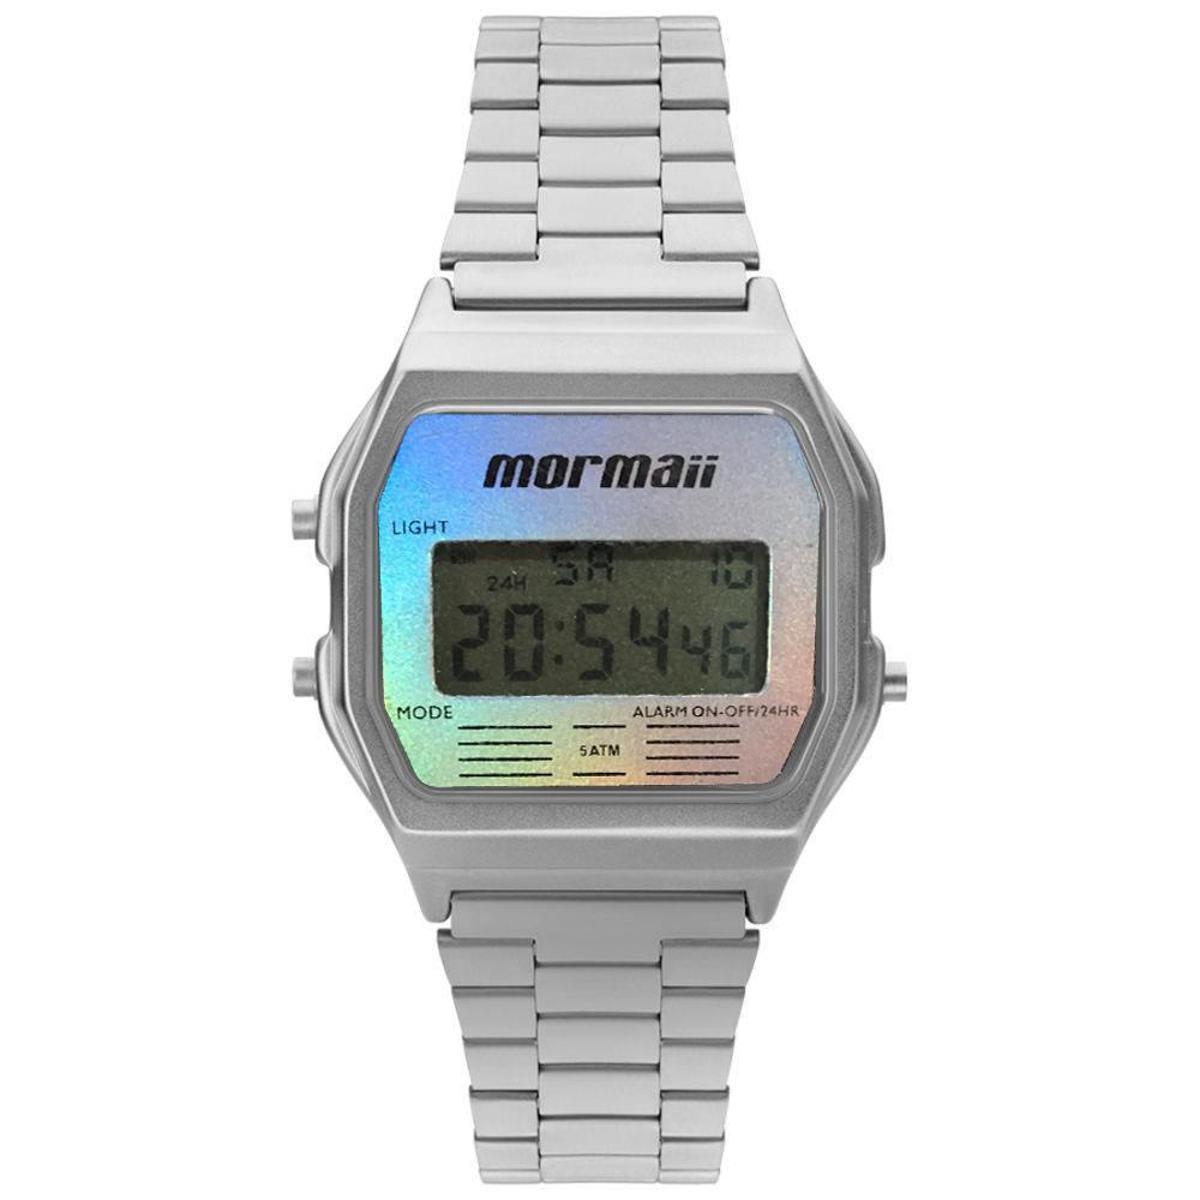 0beabf29b58cf Relógio Mormaii Vintage Digital Masculino - Compre Agora